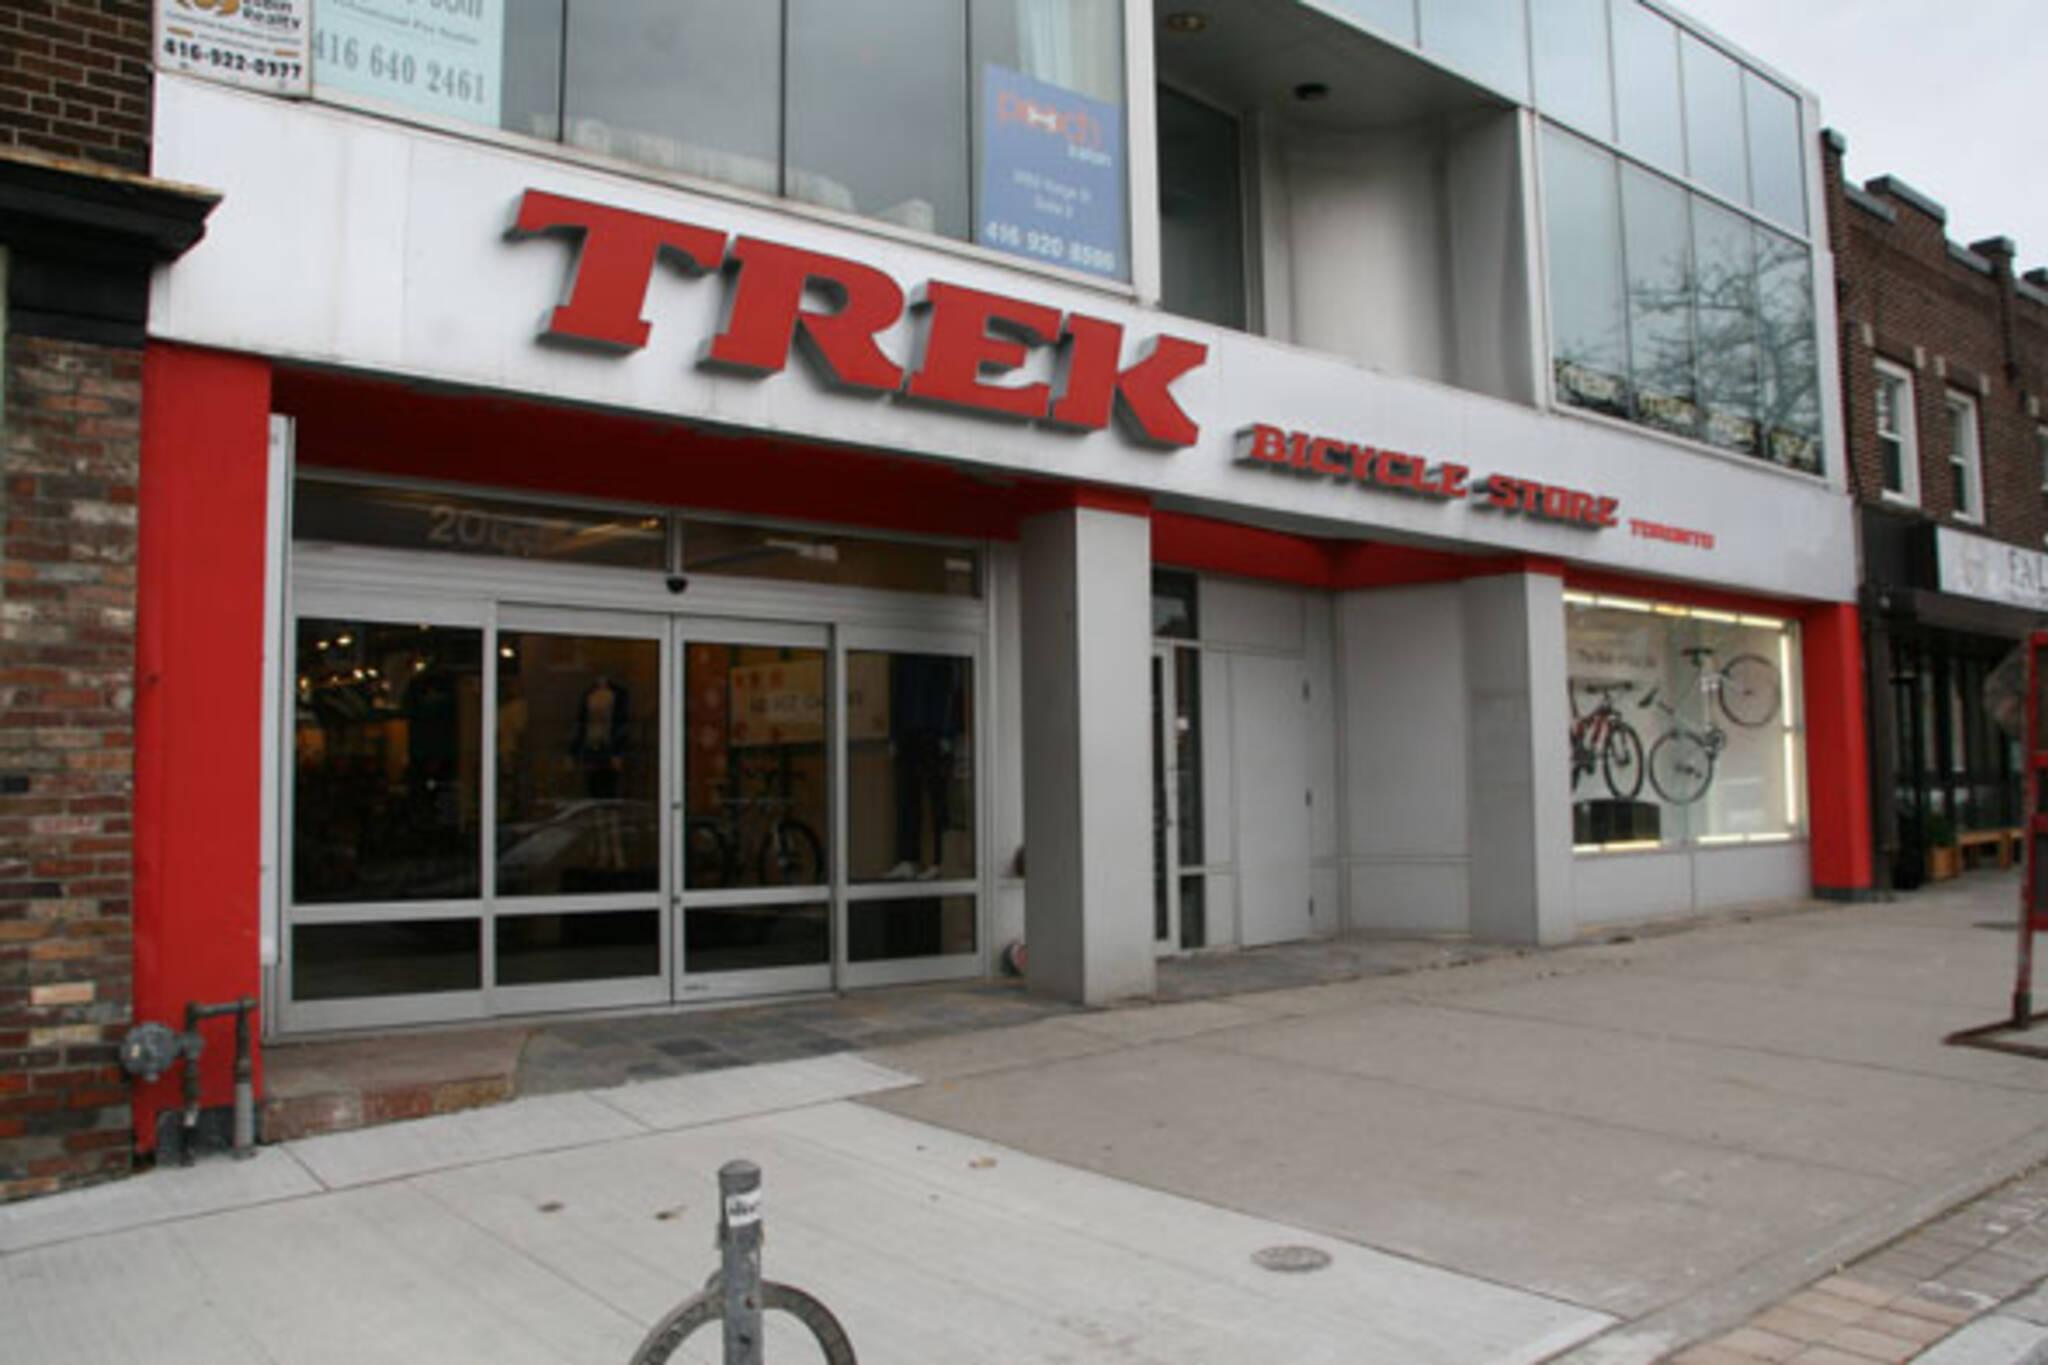 Trek Bicycle Store Toronto